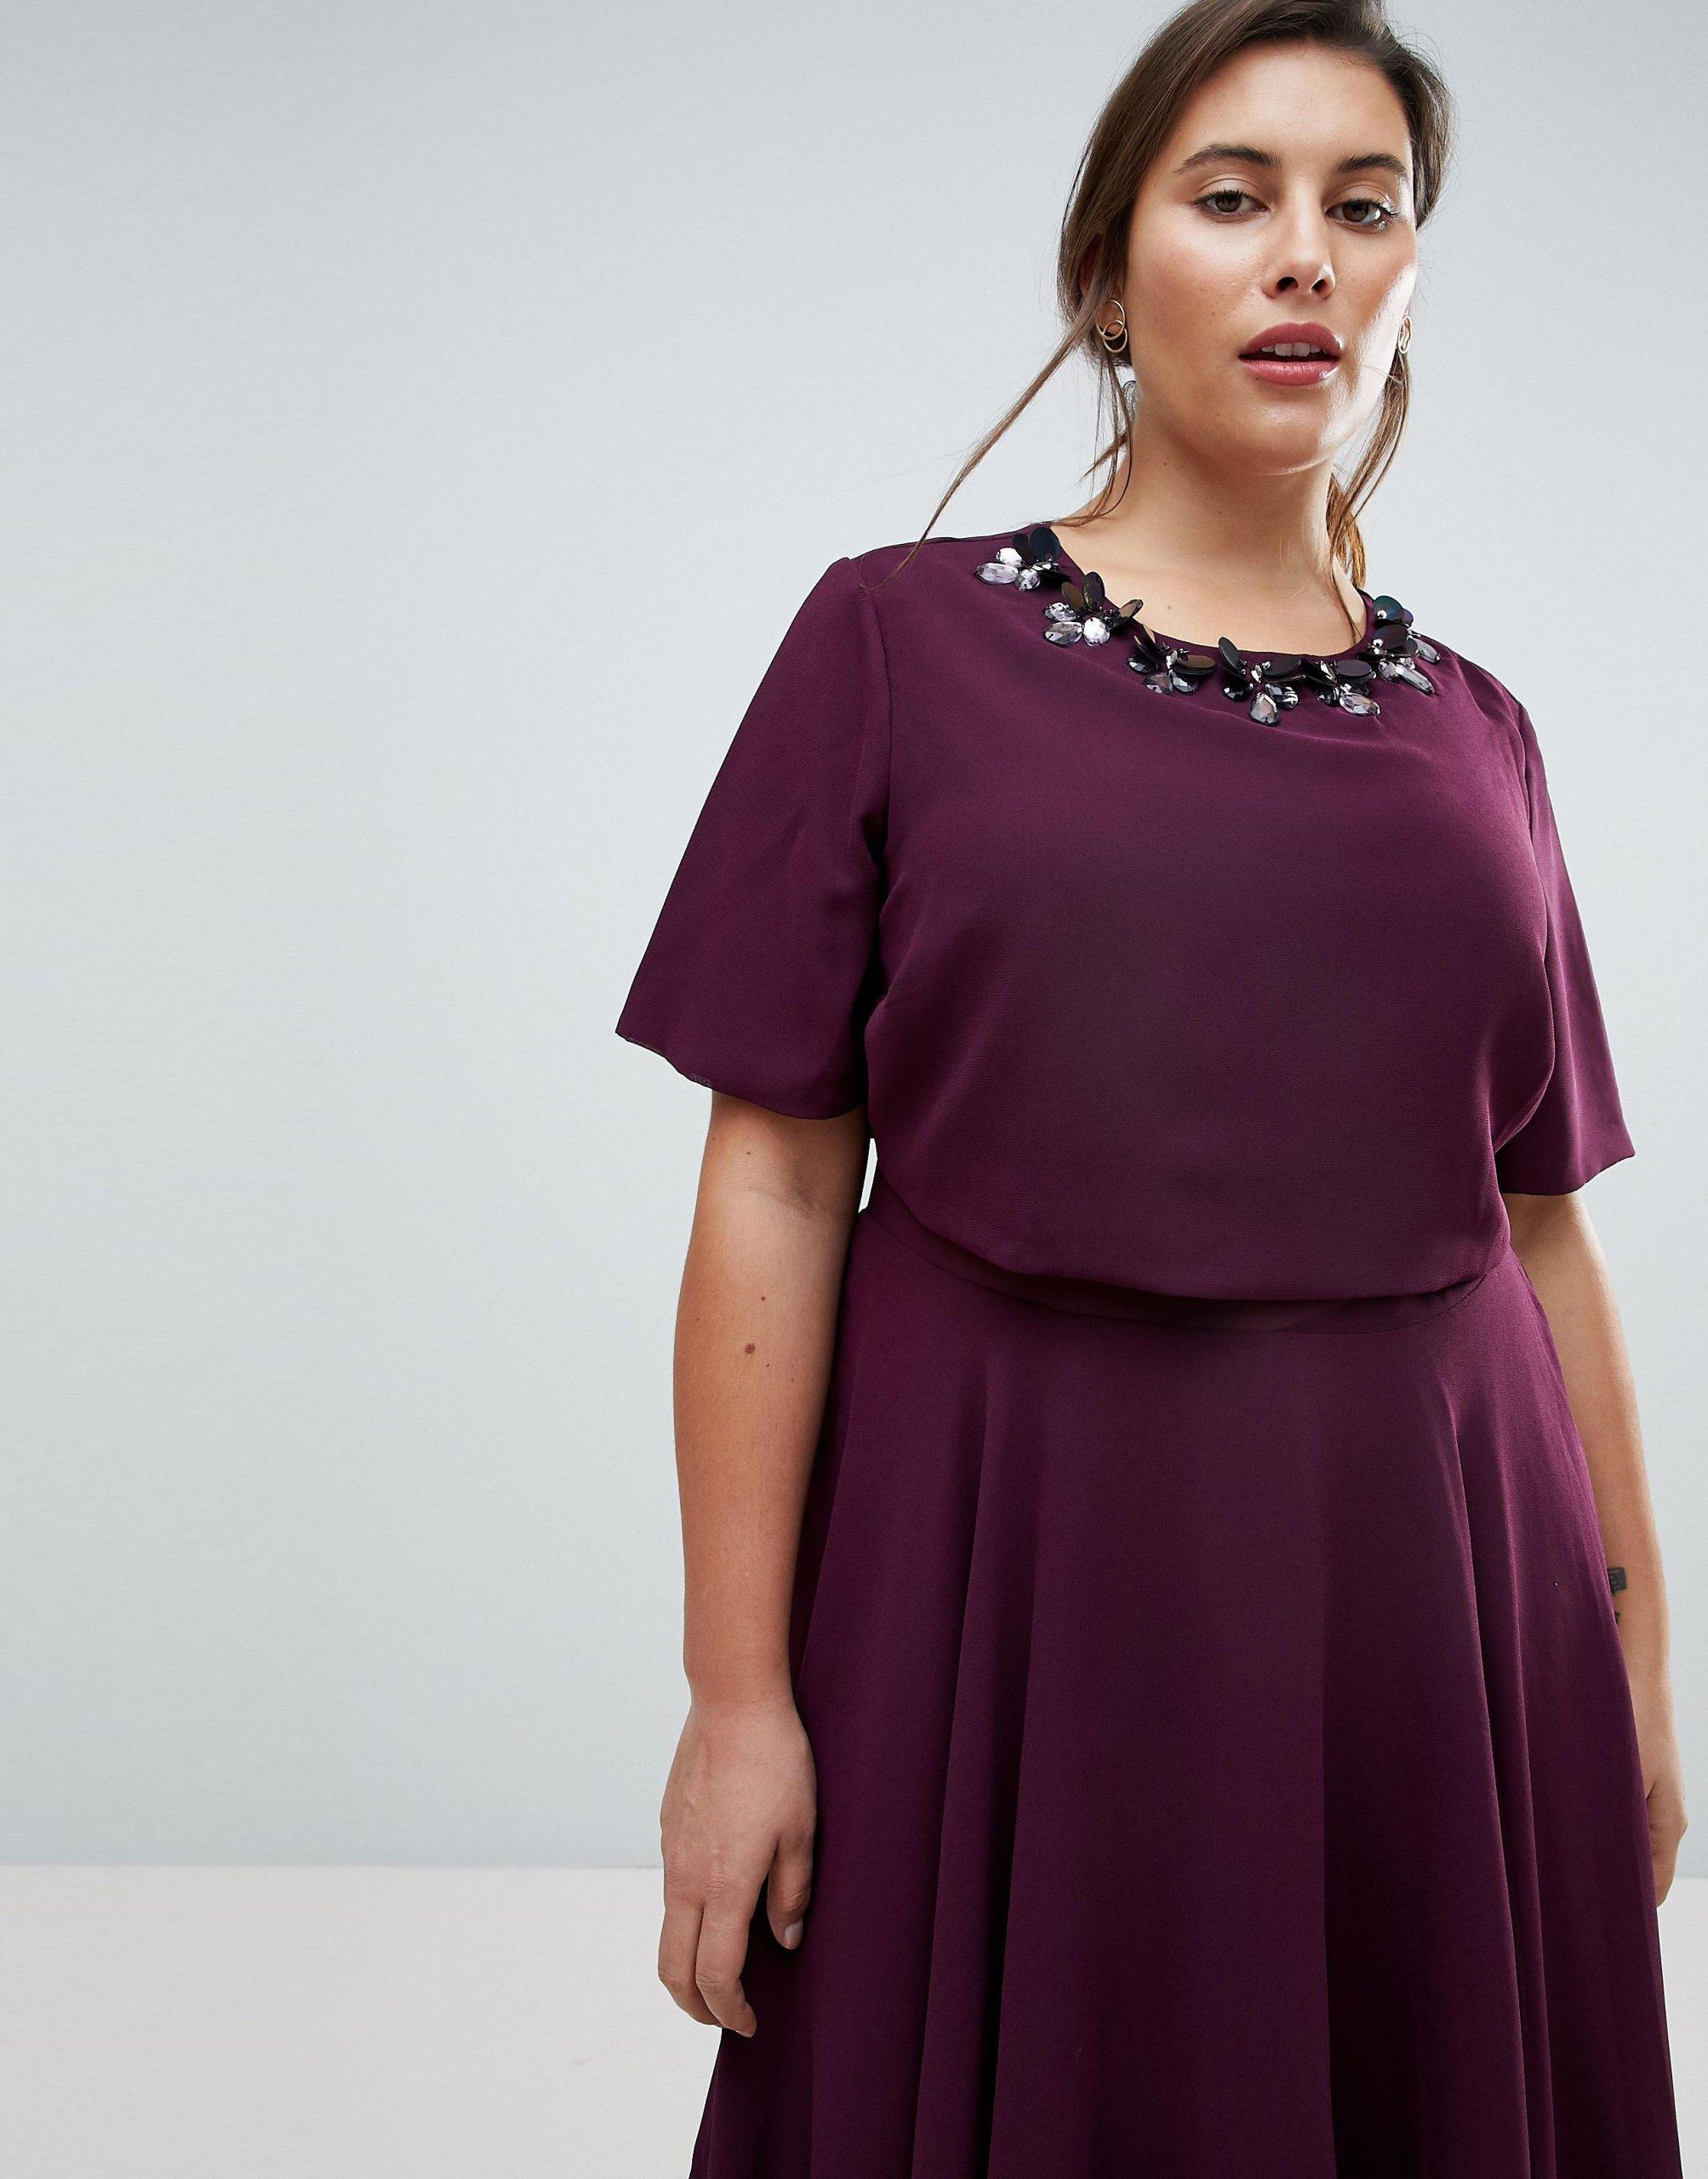 a28b9220d7 Fioletowa midi rozkloszowana sukienka 6XL 52 - 7322329273 ...